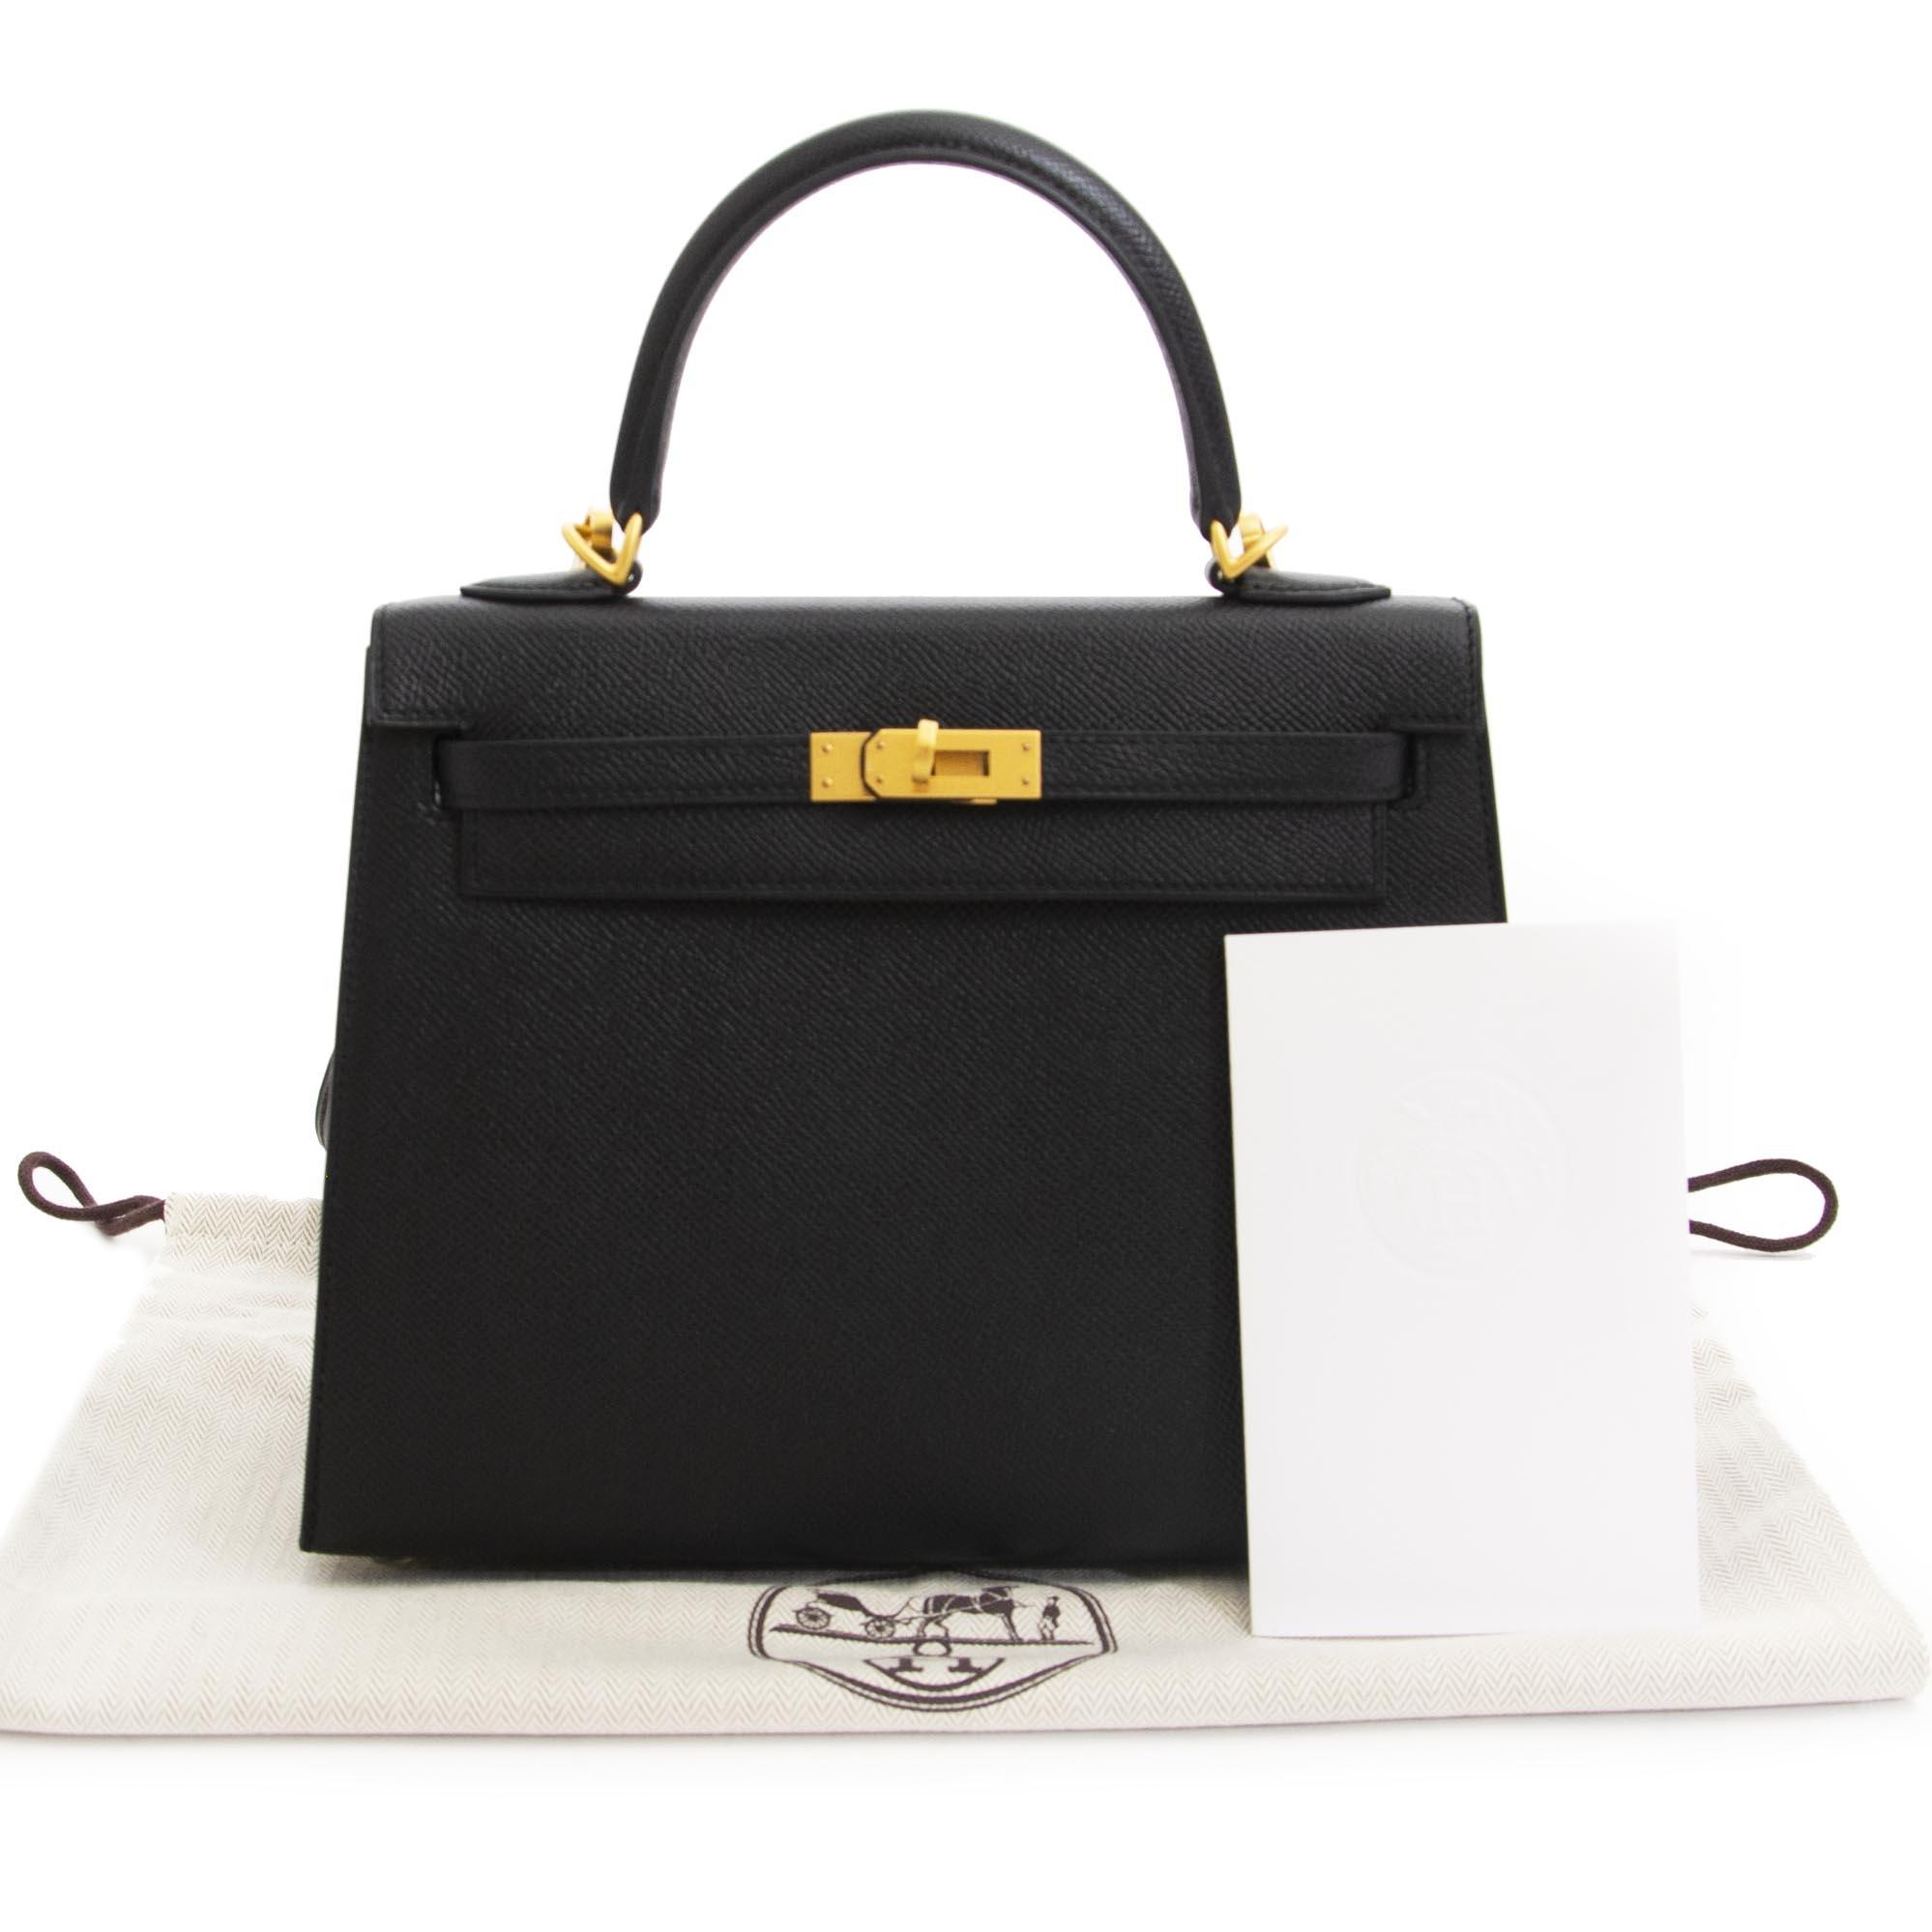 Hermès Kelly 25cm HSS Black Epsom Brushed GHW Rose Pourpre Horseshoe